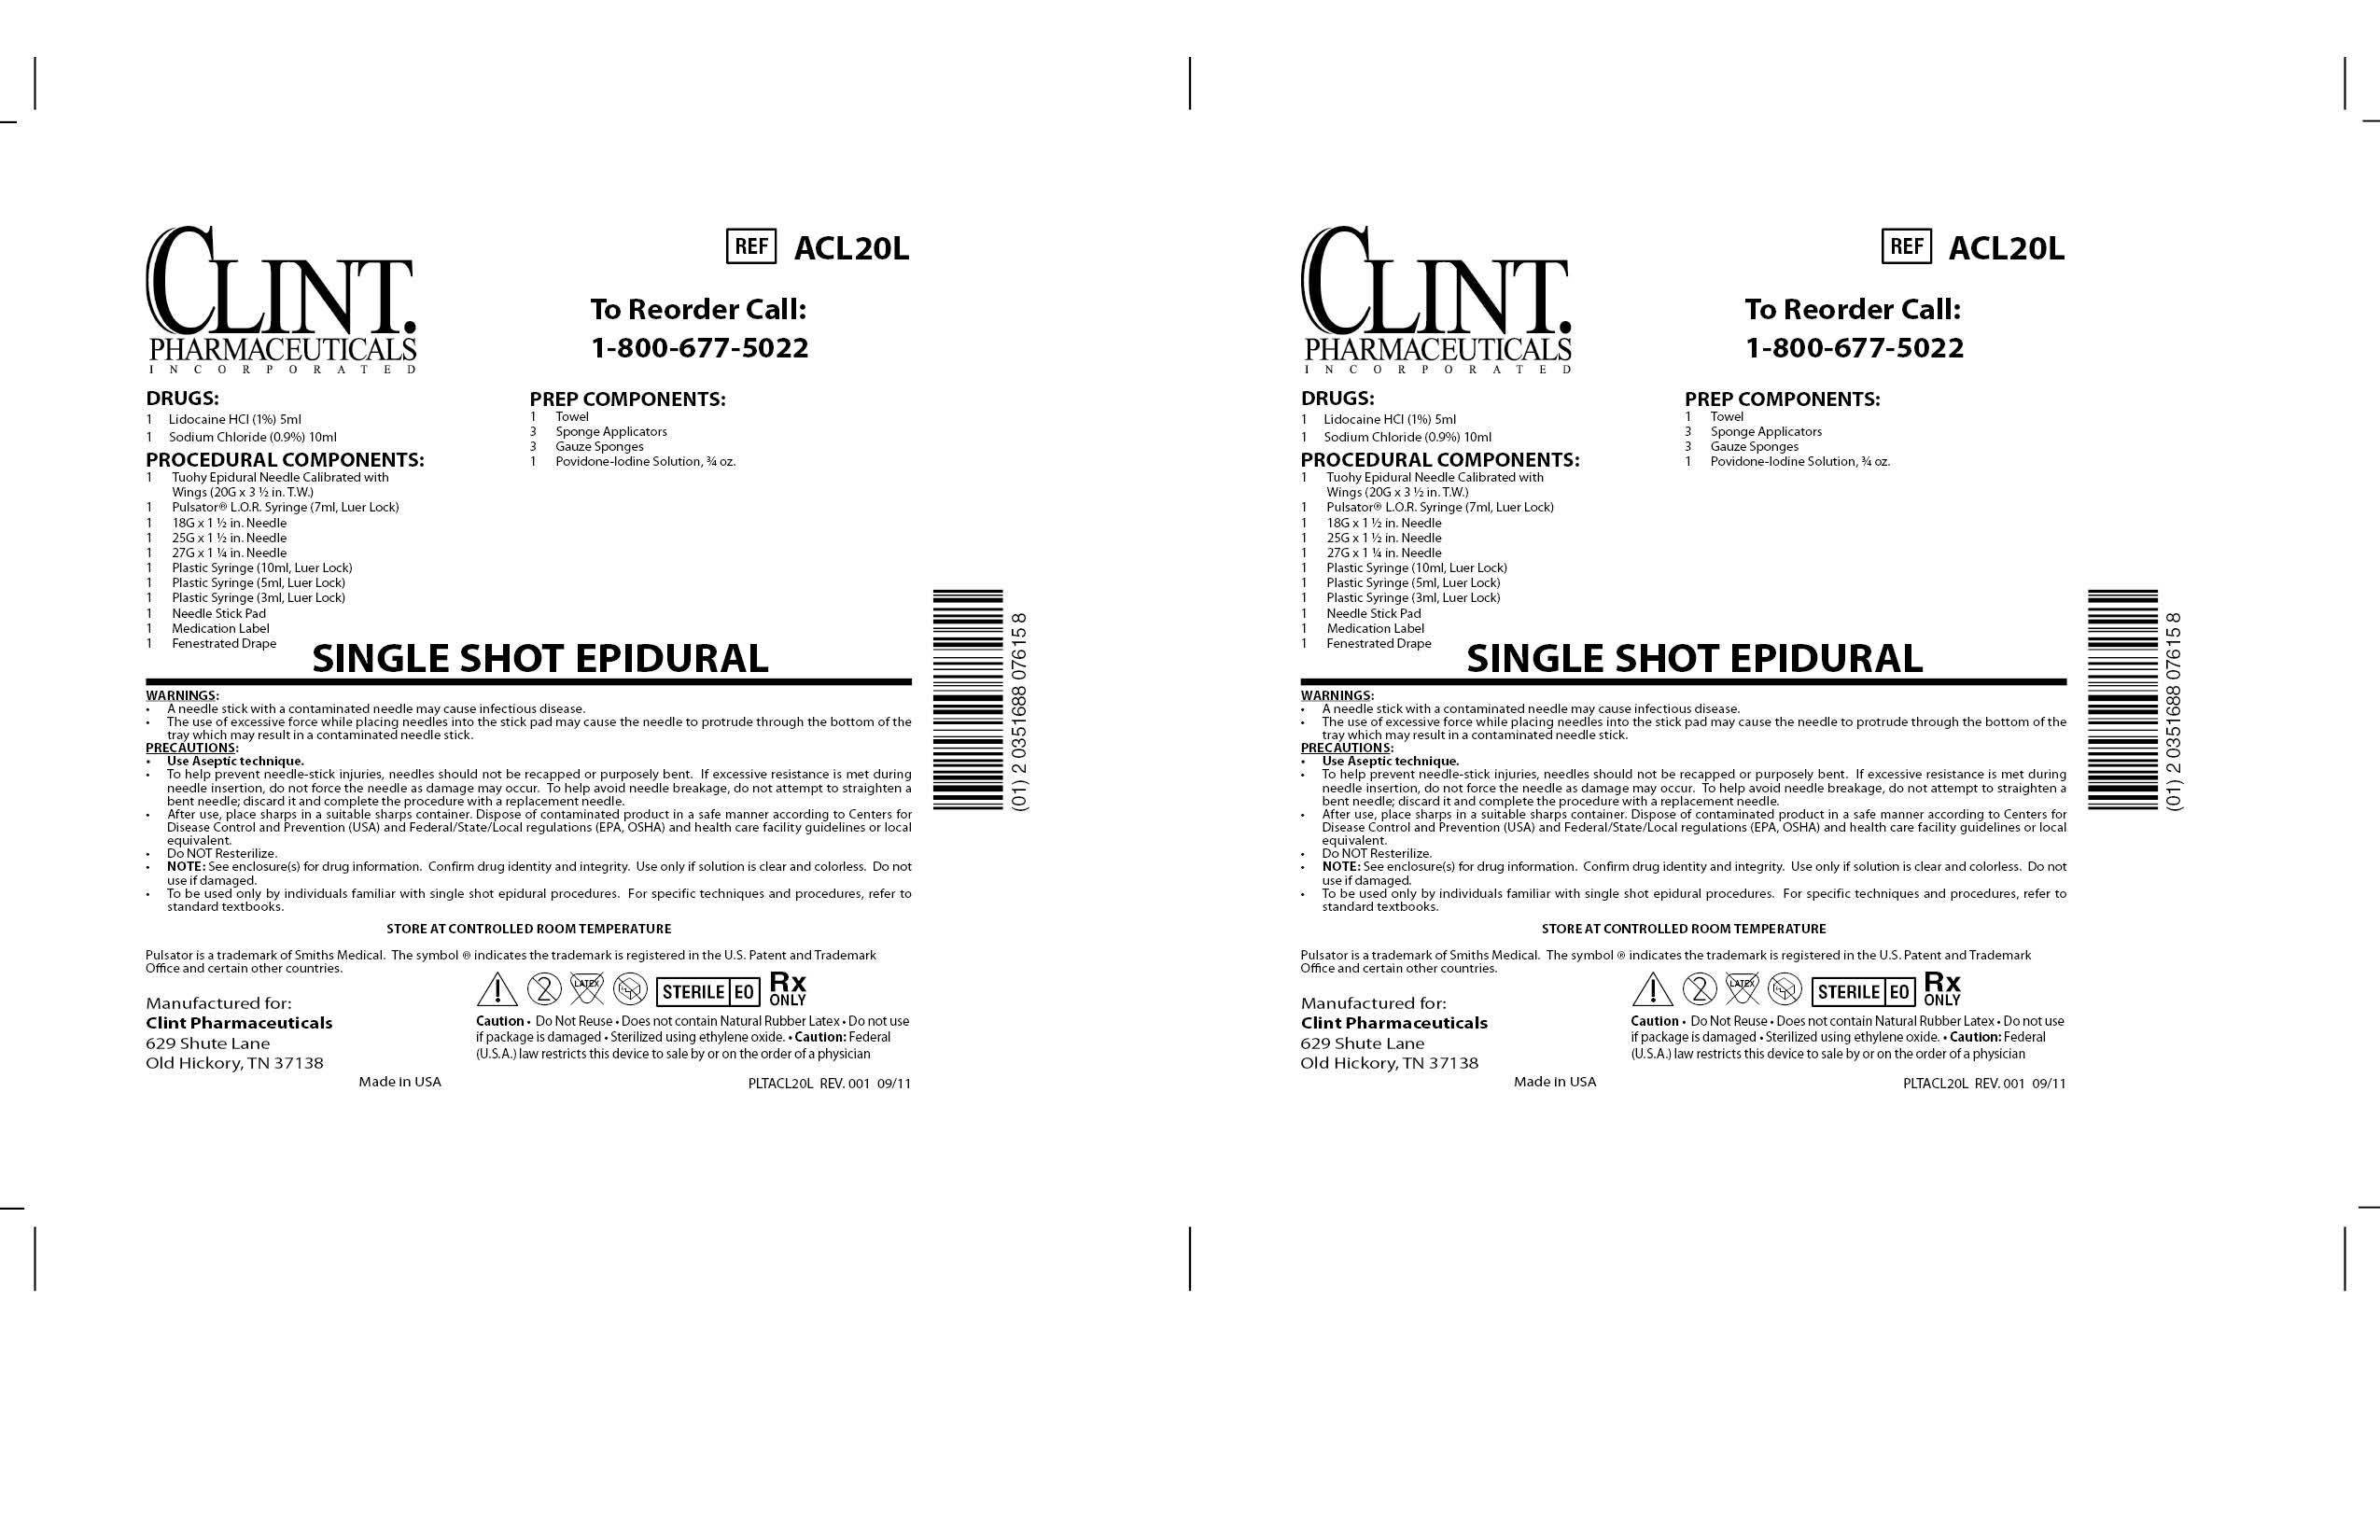 Acl20l Single Shot Epidural () Kit [Clint Pharmaceuticals, Inc.]